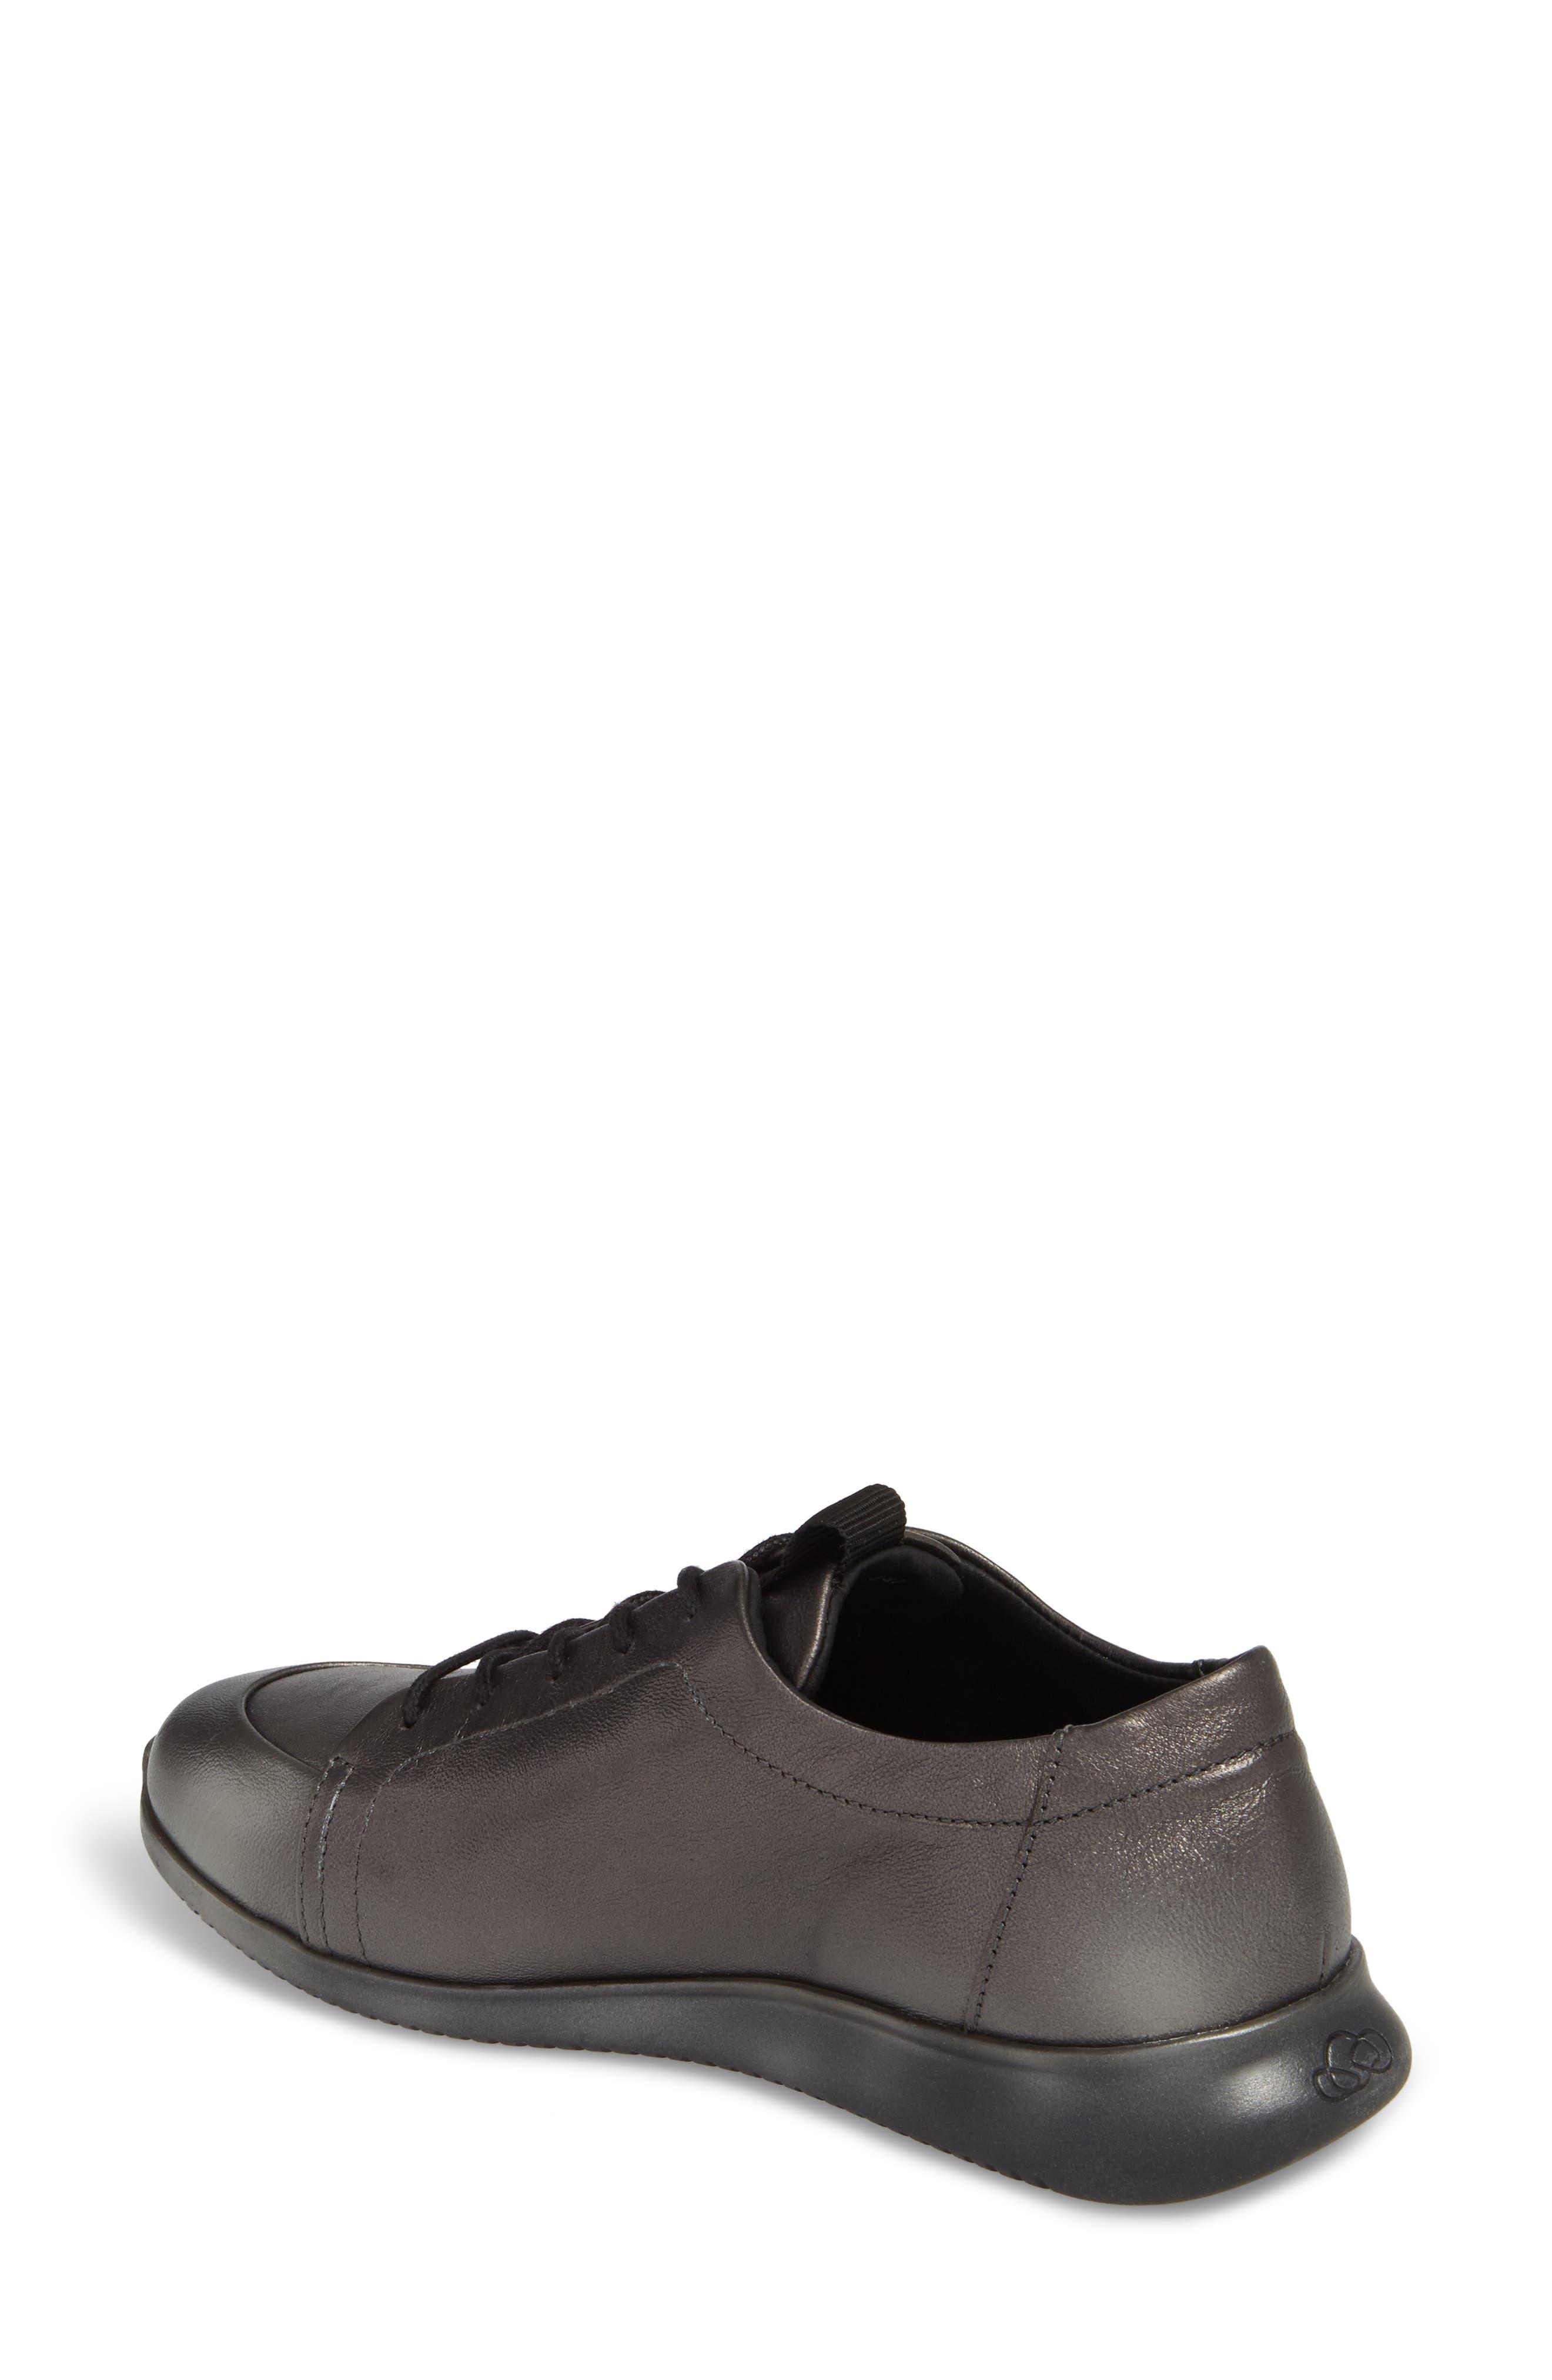 Ria Sneaker,                             Alternate thumbnail 2, color,                             Pirita Leather